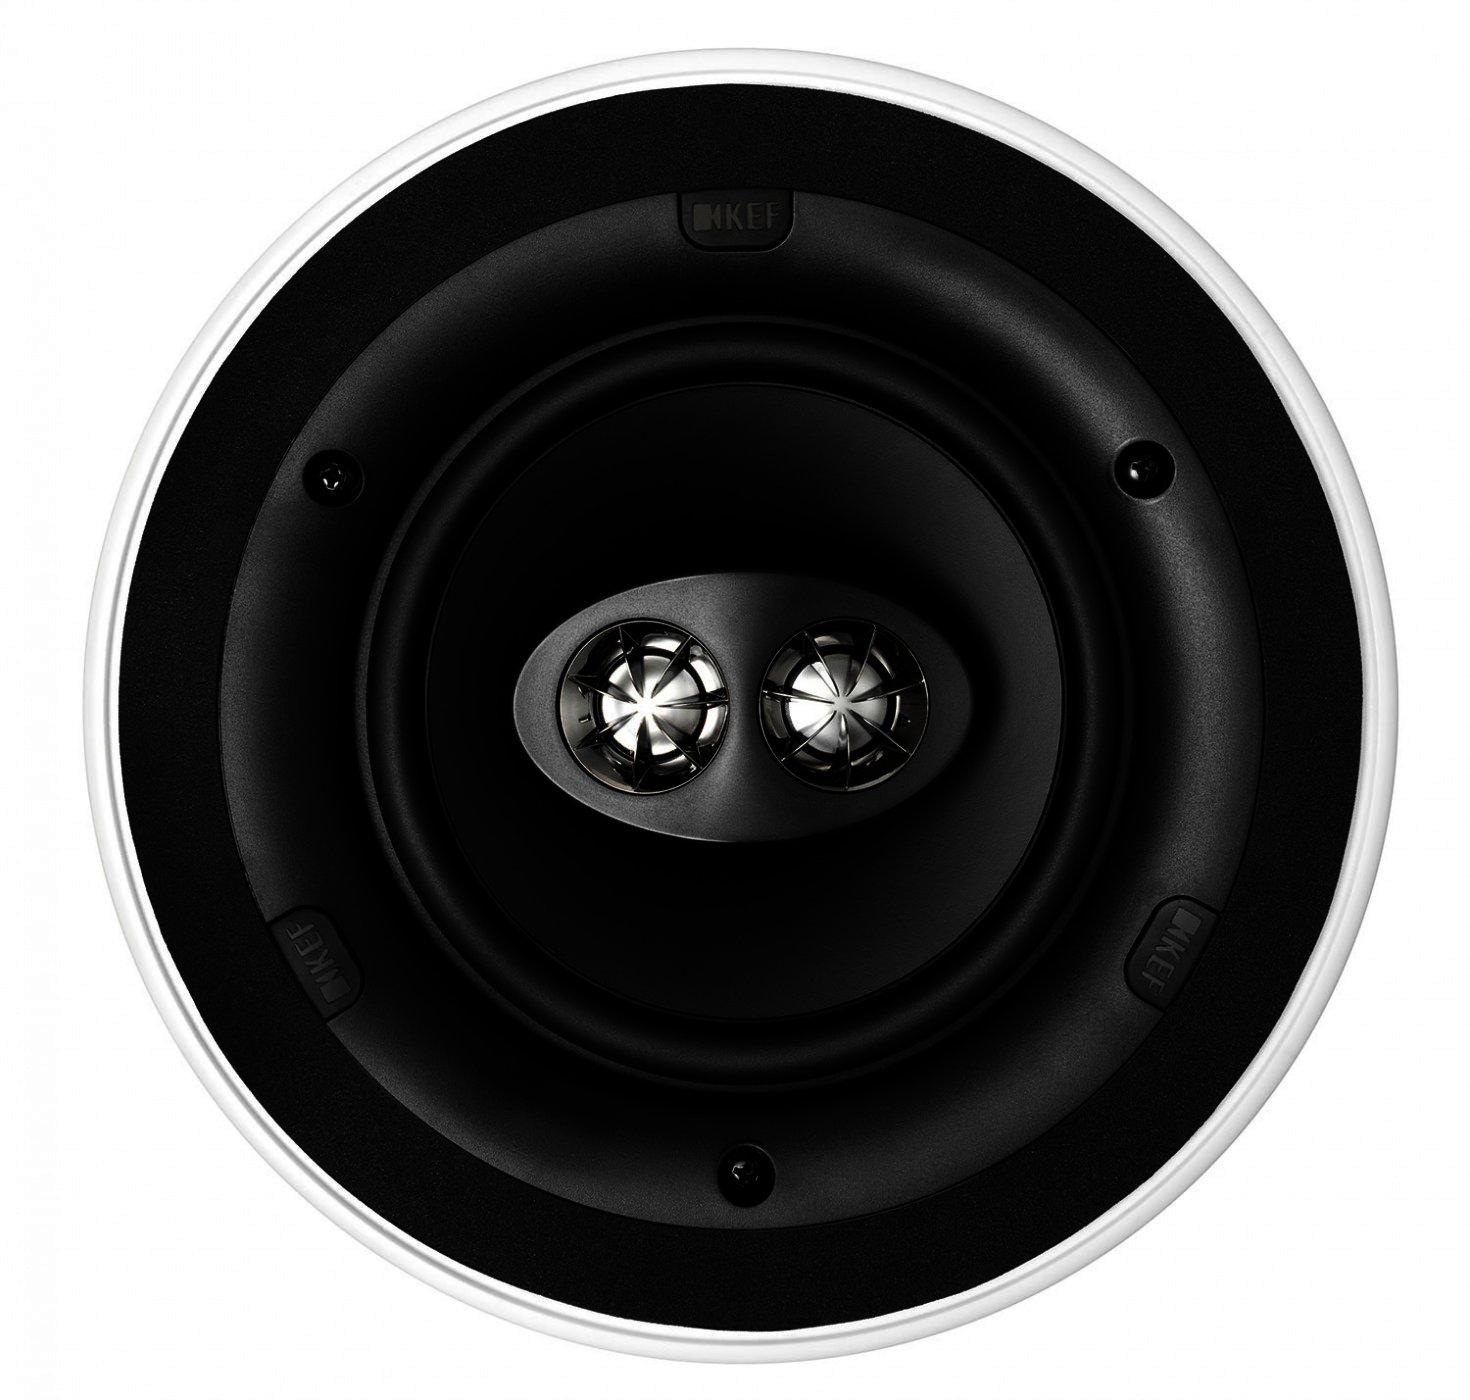 kef ci160crds doppel stereo lautsprecher einbau. Black Bedroom Furniture Sets. Home Design Ideas